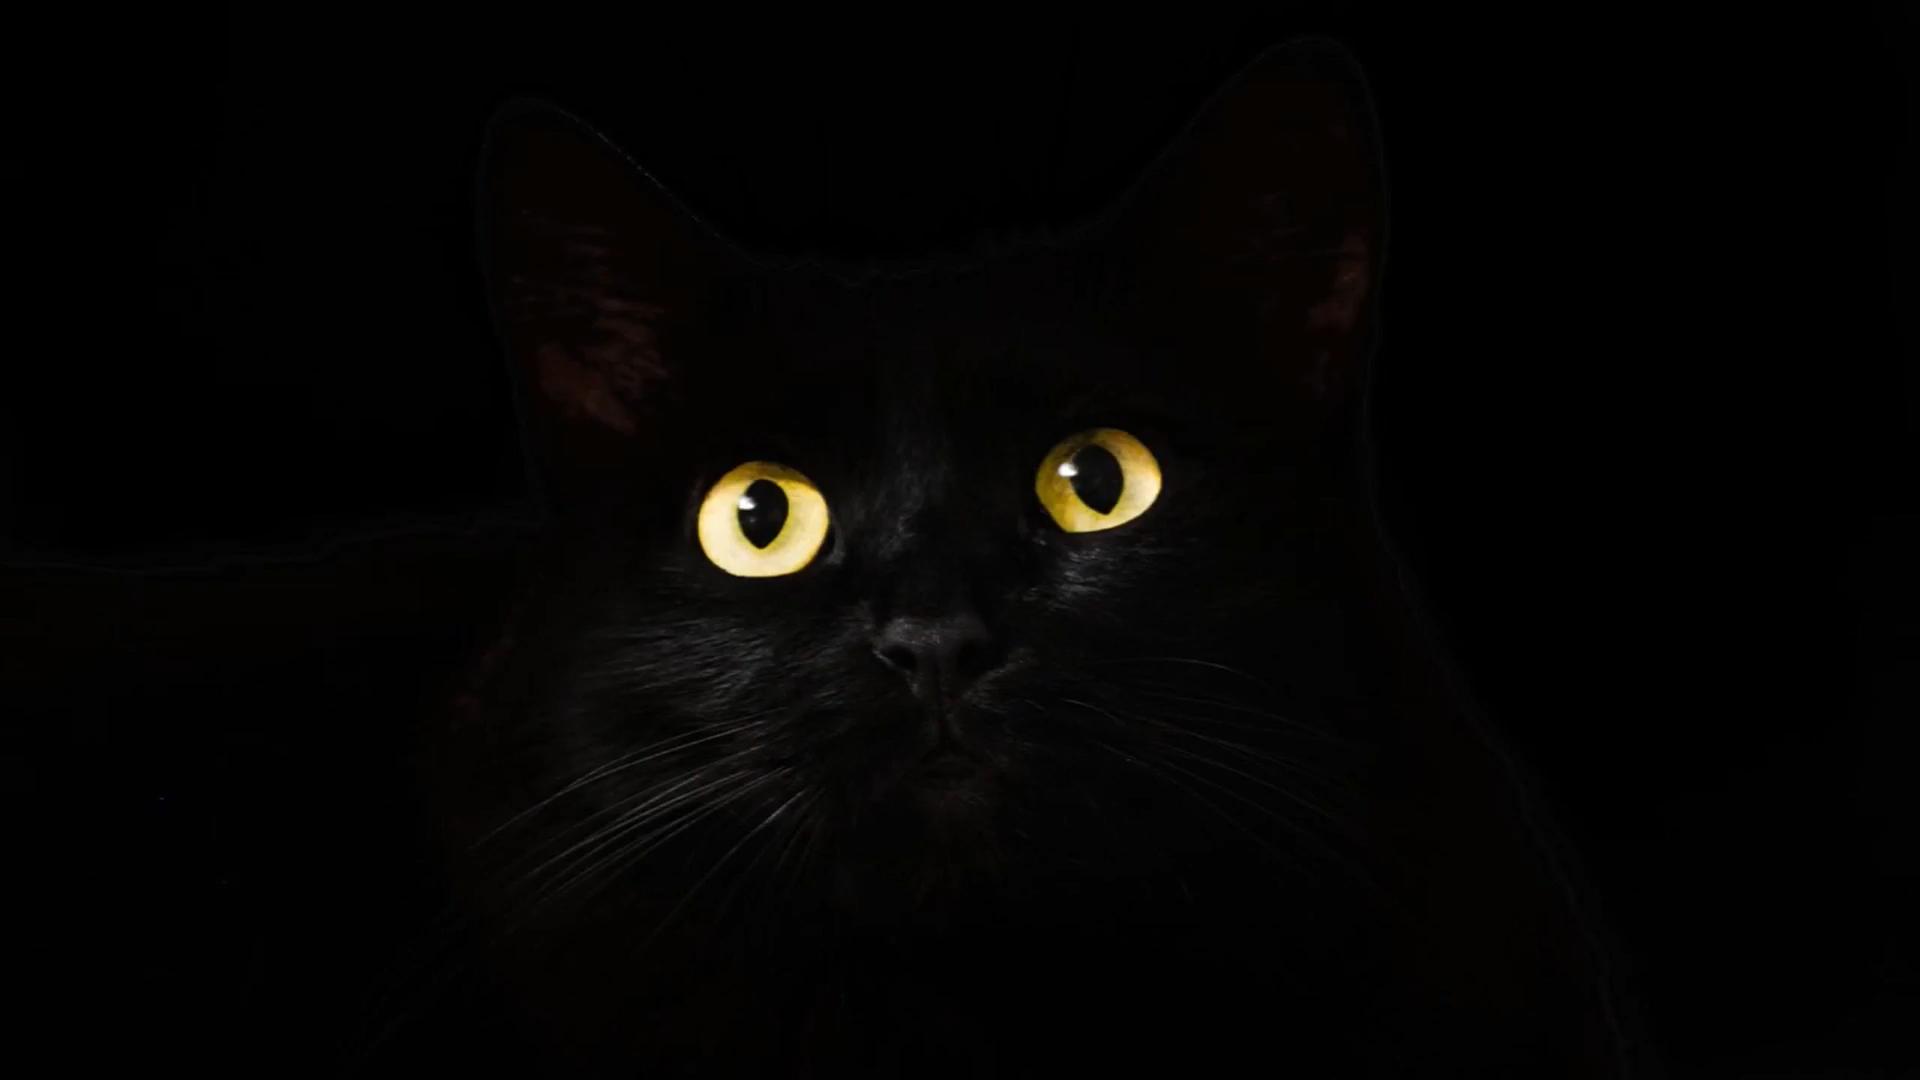 Cat Huxley